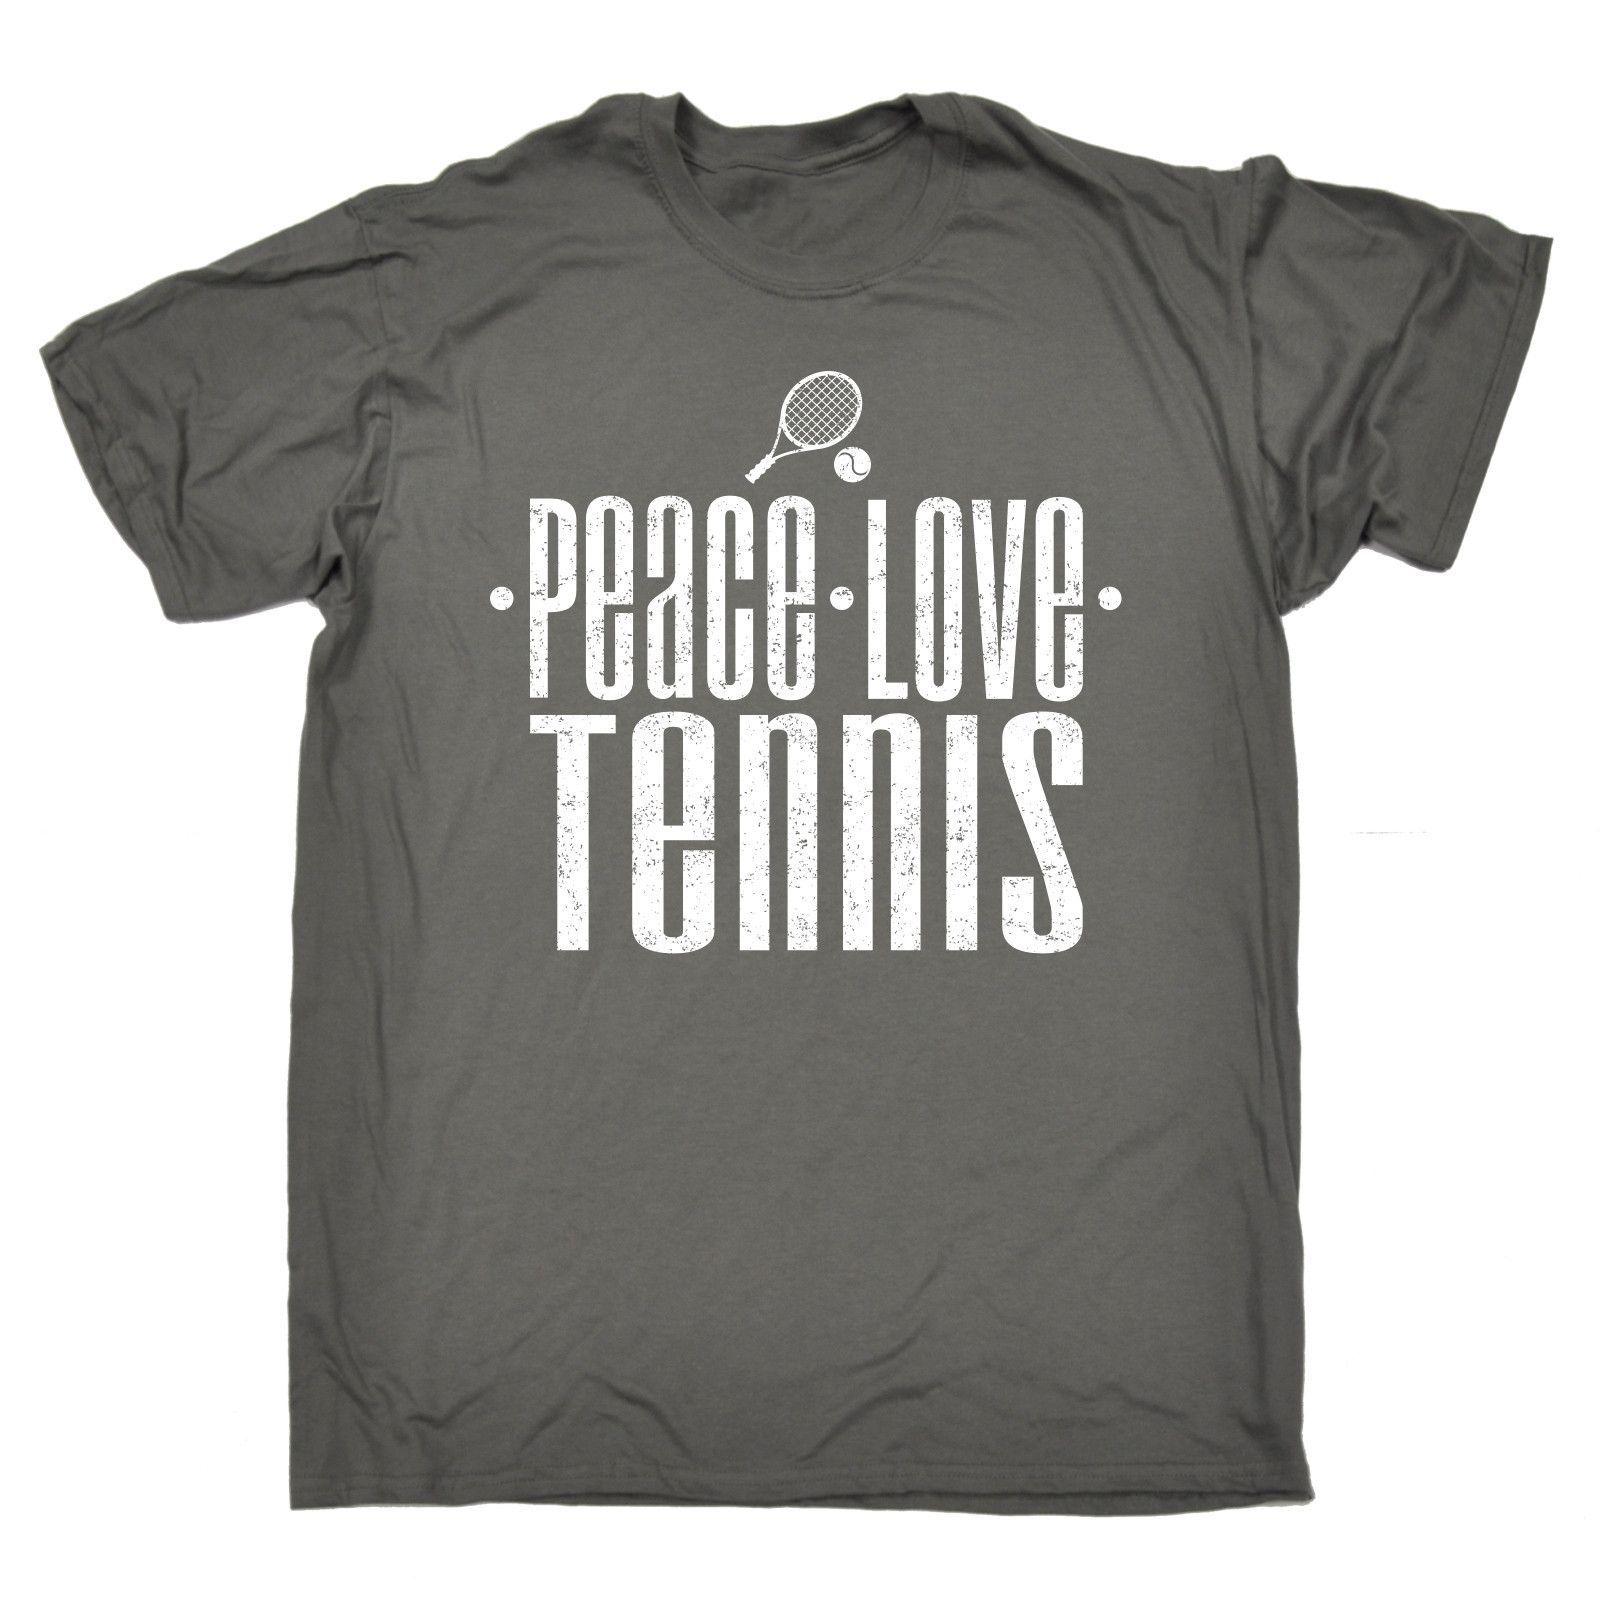 123t USA Men's Peace Love Tennis Funny T-Shirt